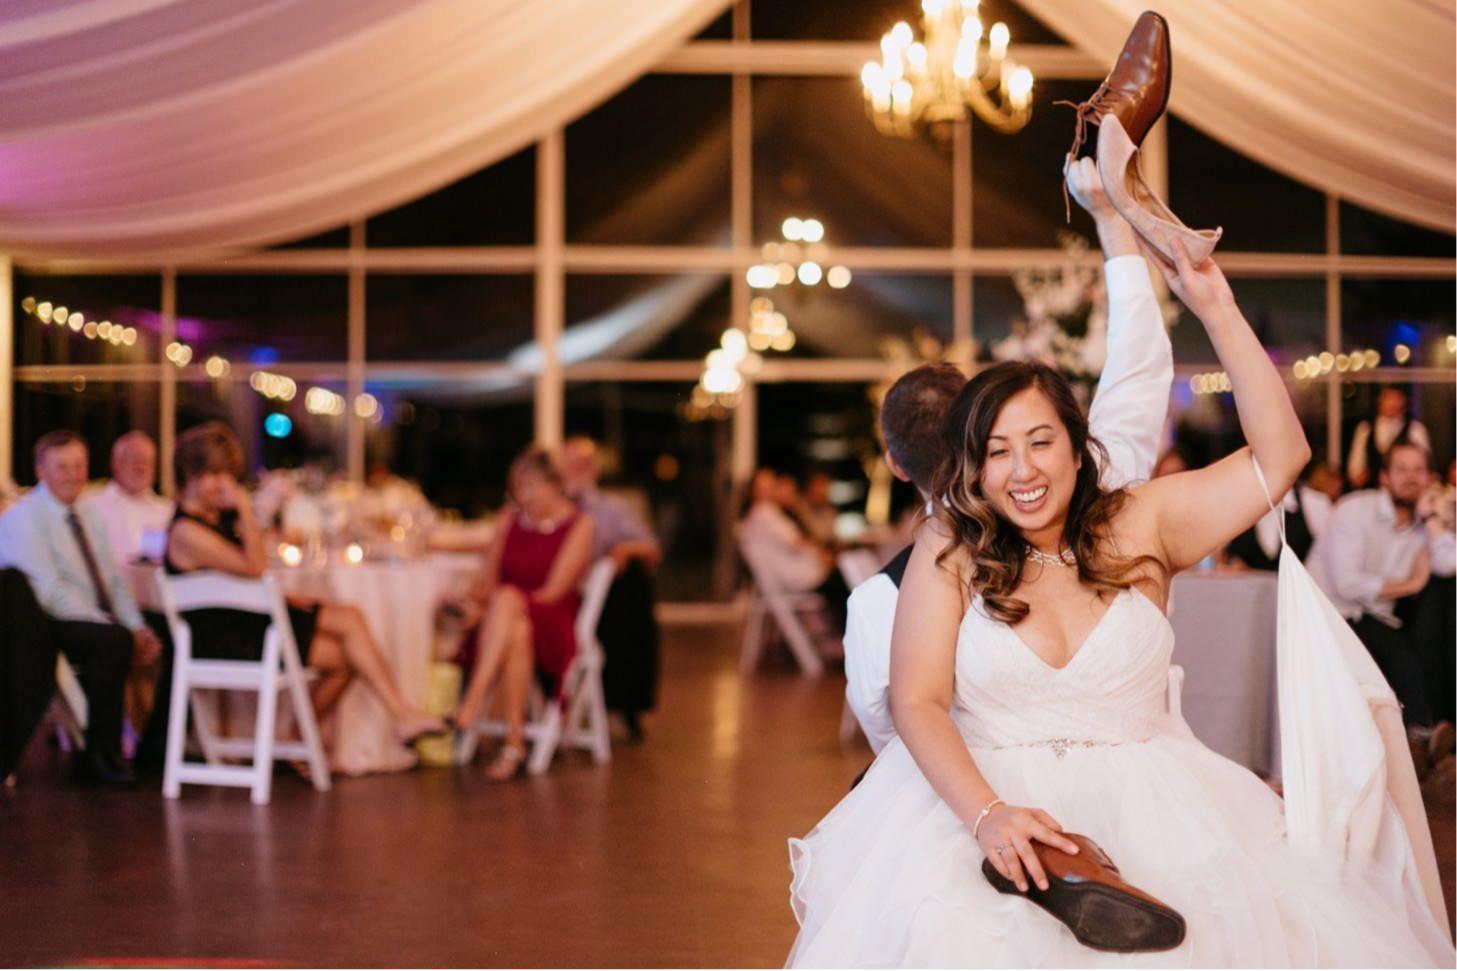 ritz-charles-wedding-reception-downtown-indianapolis-wedding-photographer070.JPG